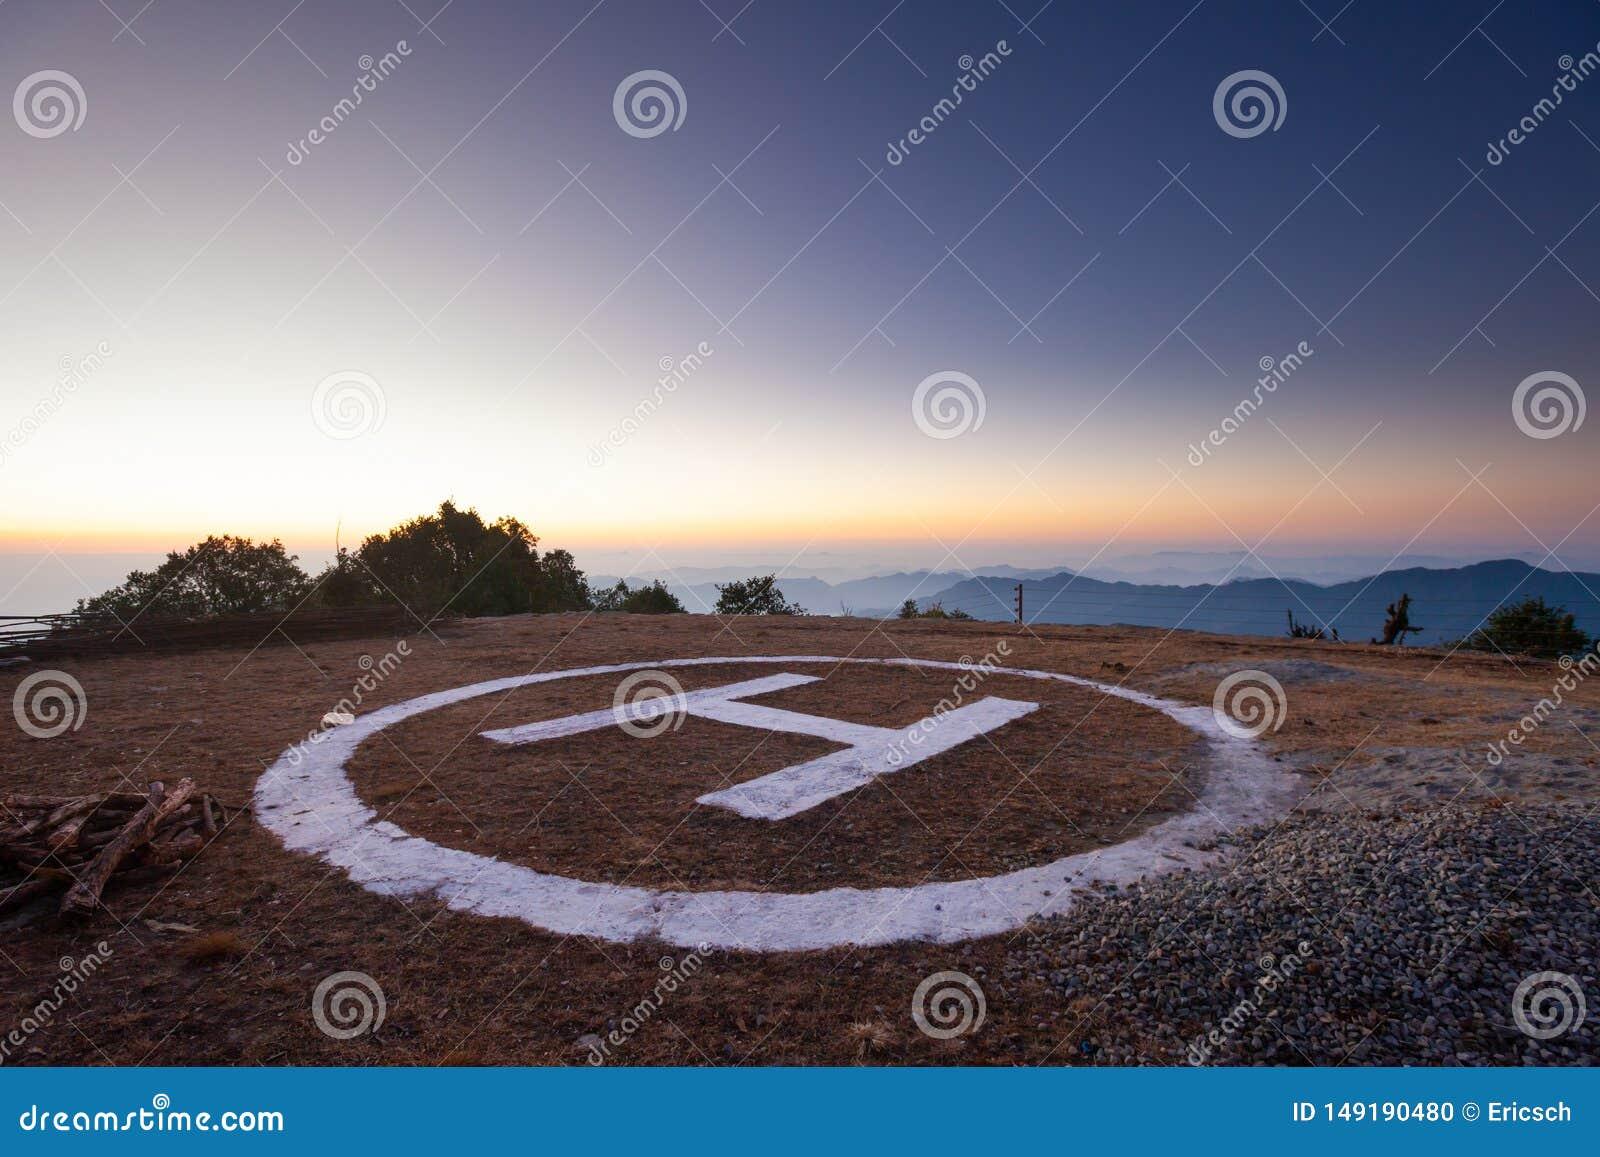 Heliporto de Nepal